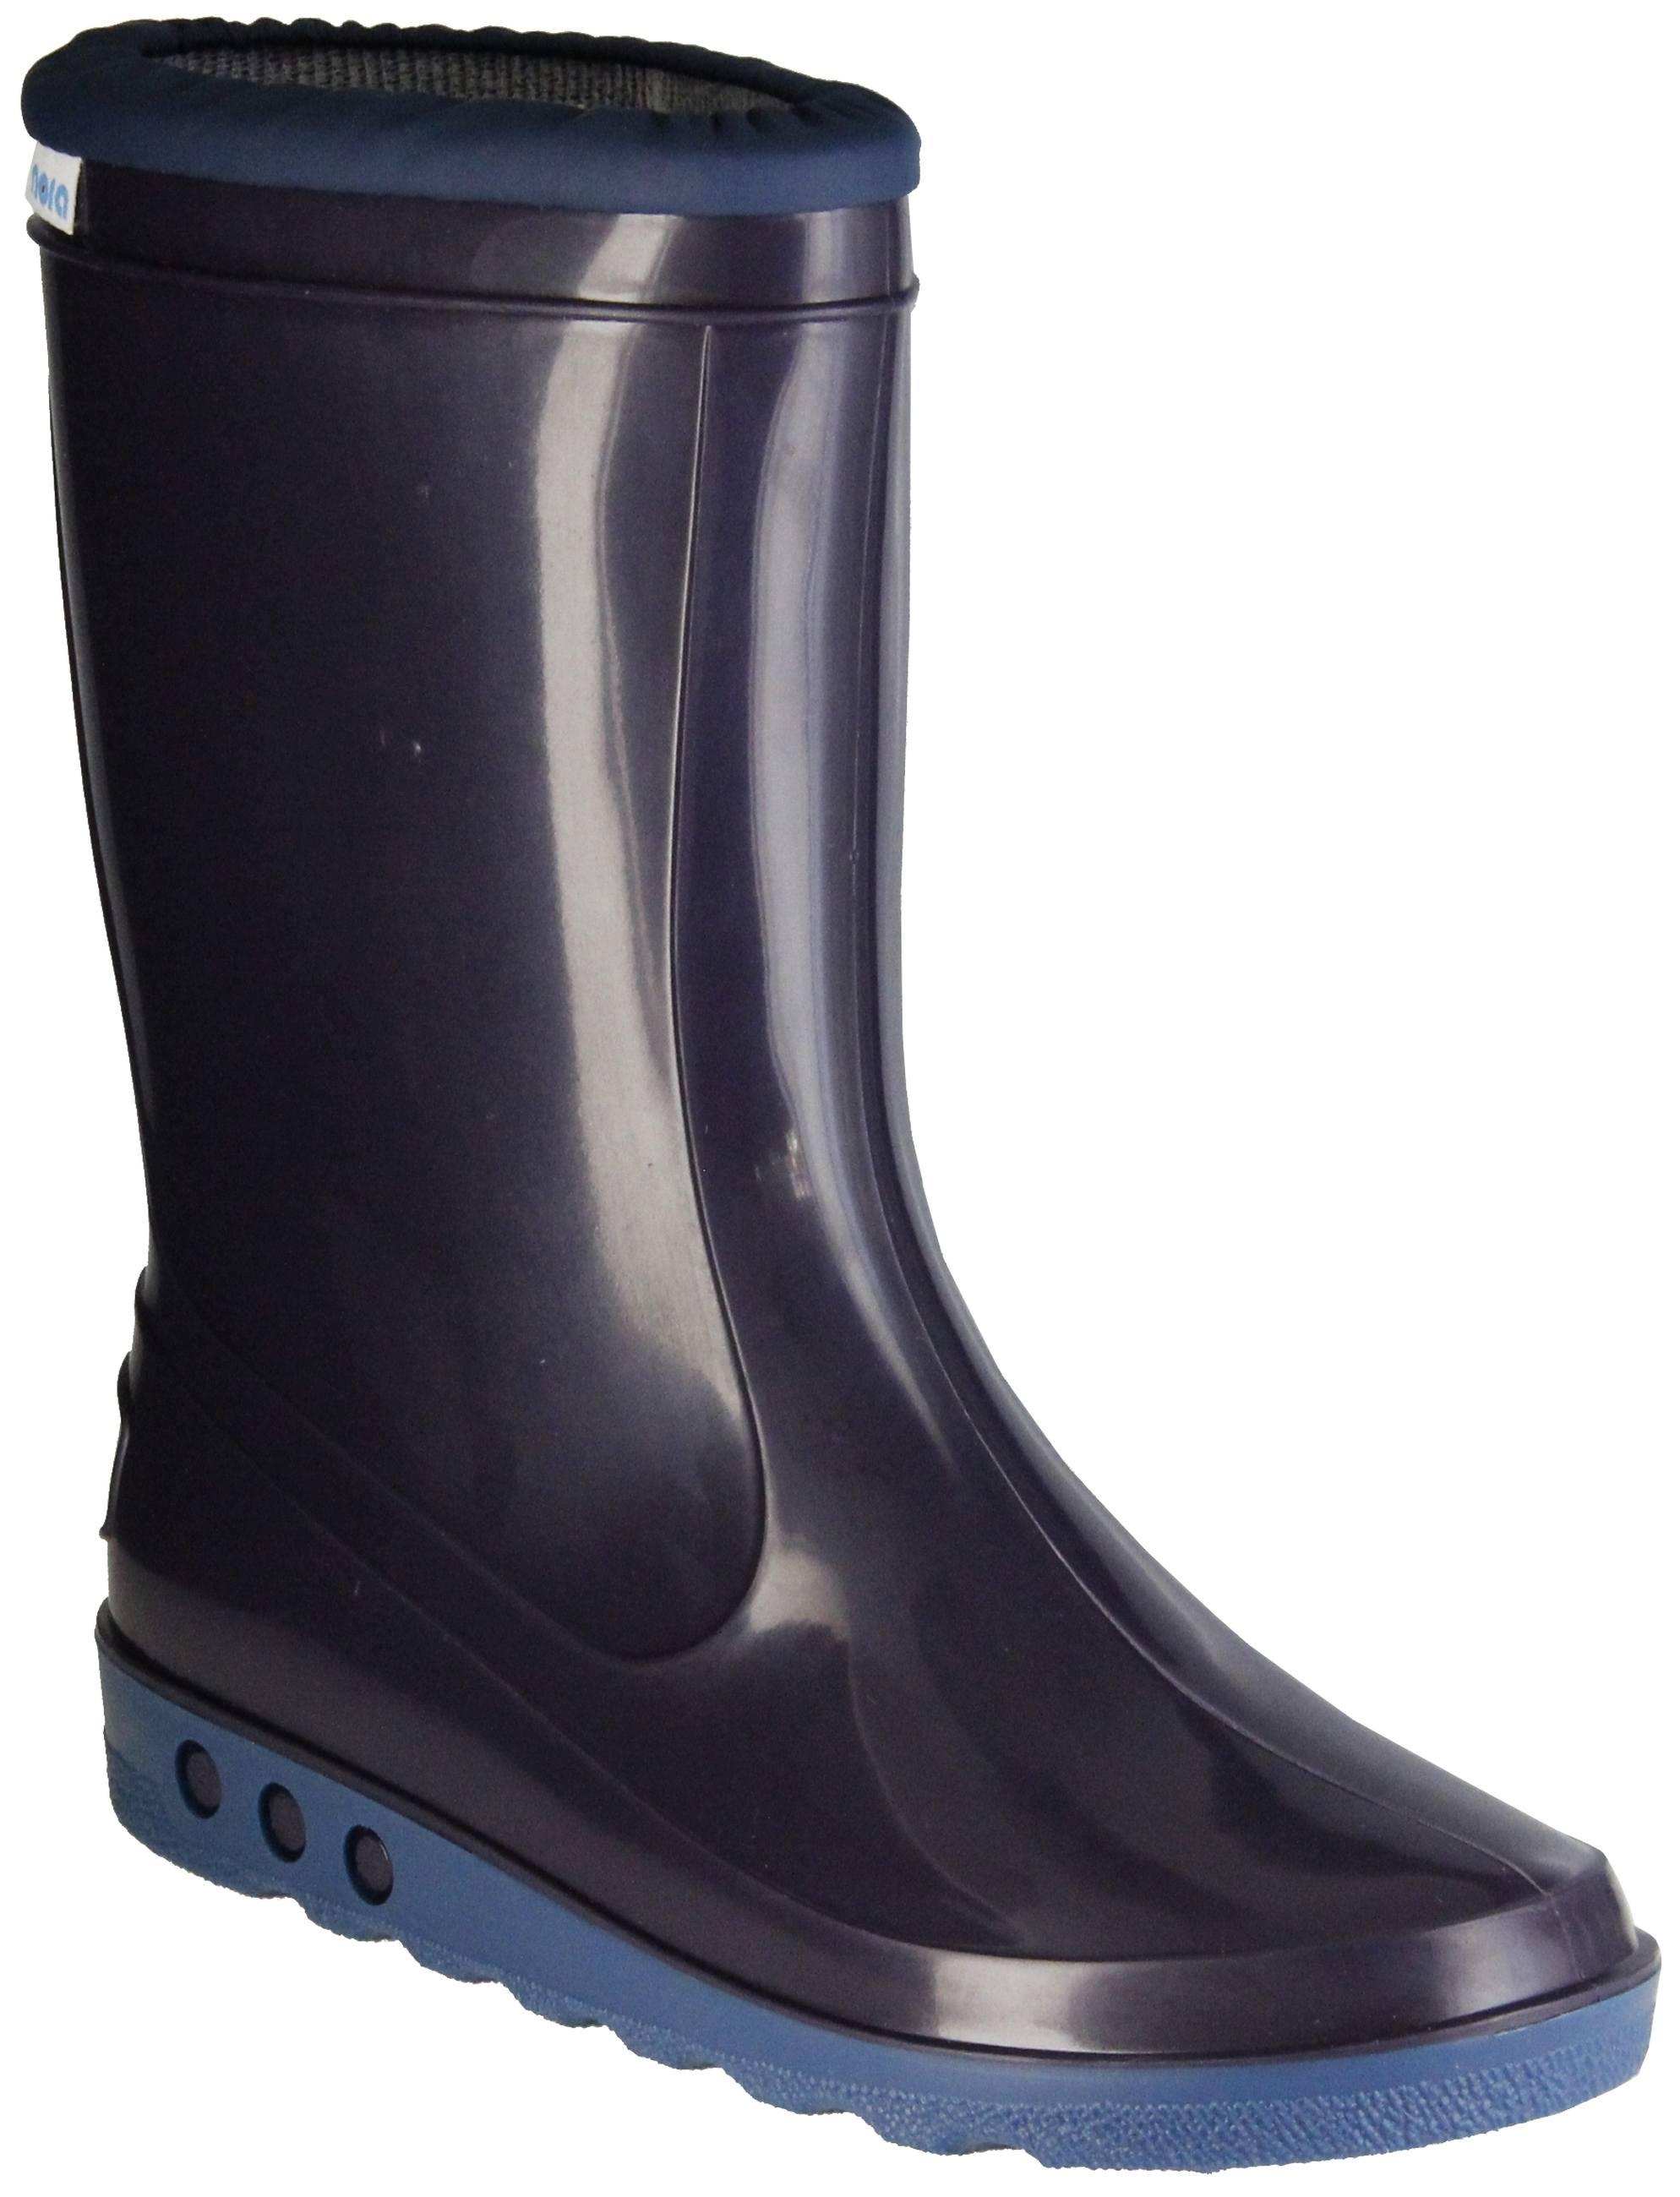 newest collection 8d429 f35ca NORA Gummistiefel blau Regenstiefel Kinder Stiefel Schuhe Nori Ocean